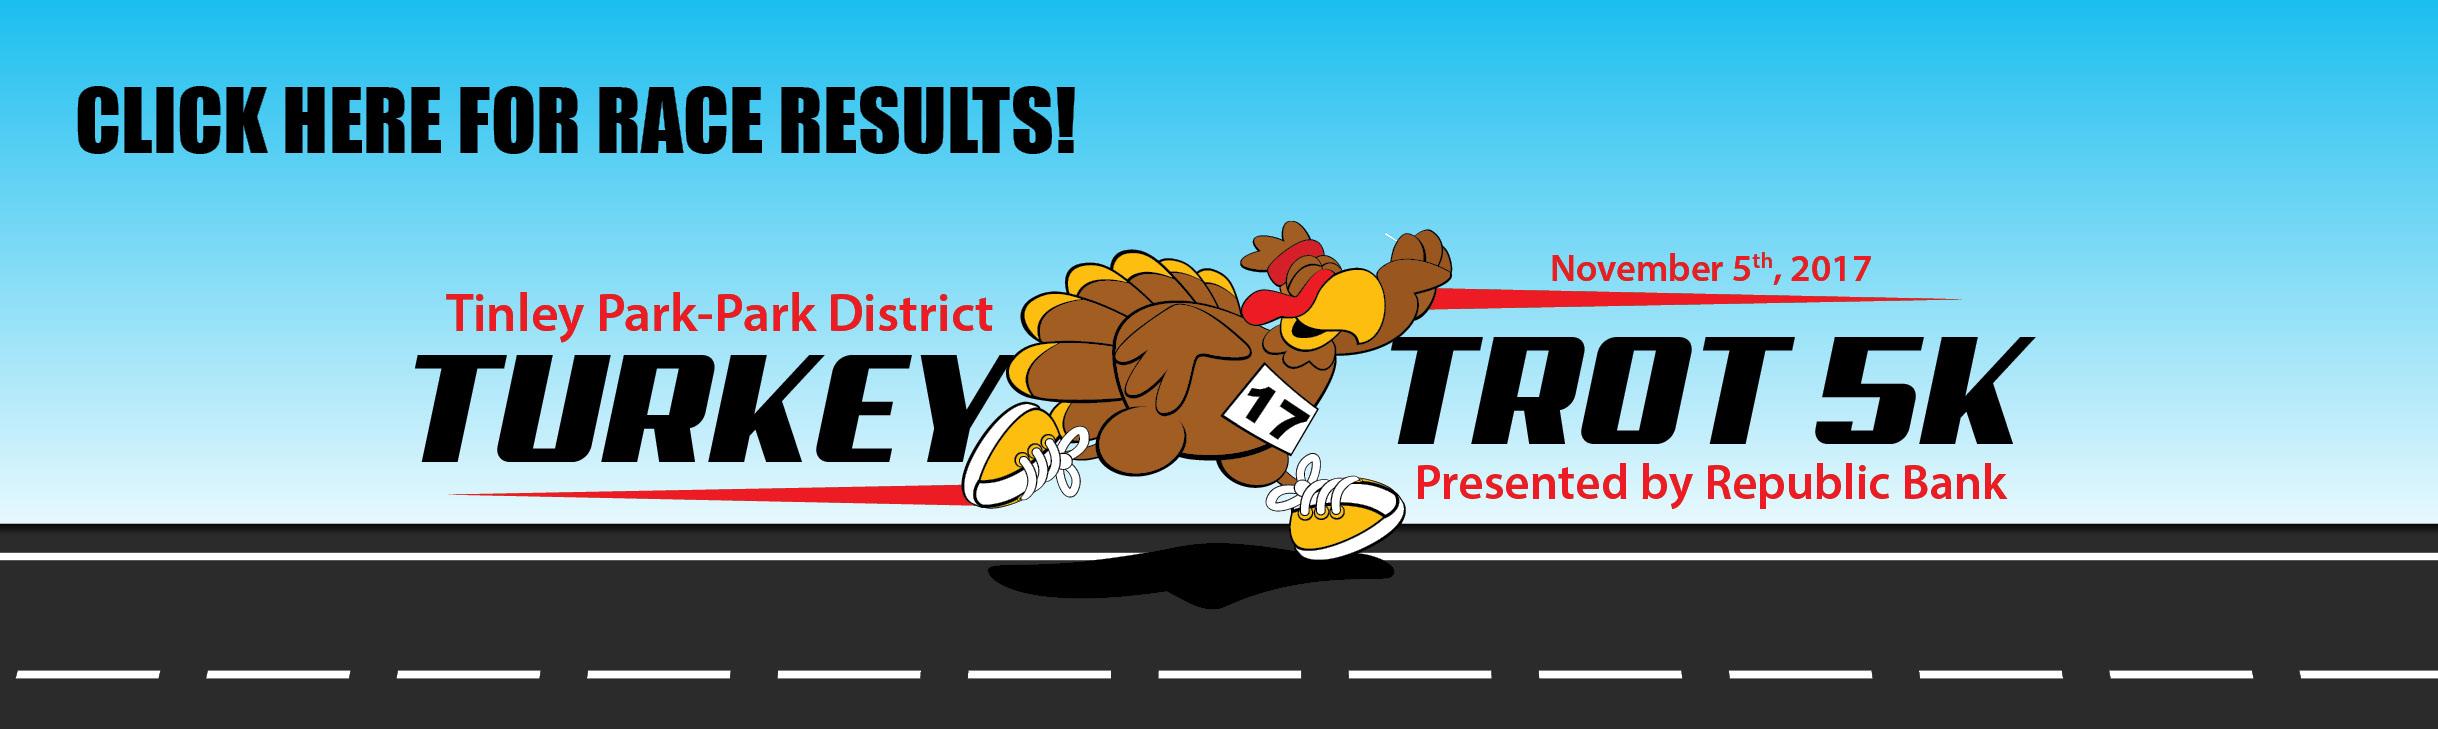 Turkey Trot 2017 Race Results Slider